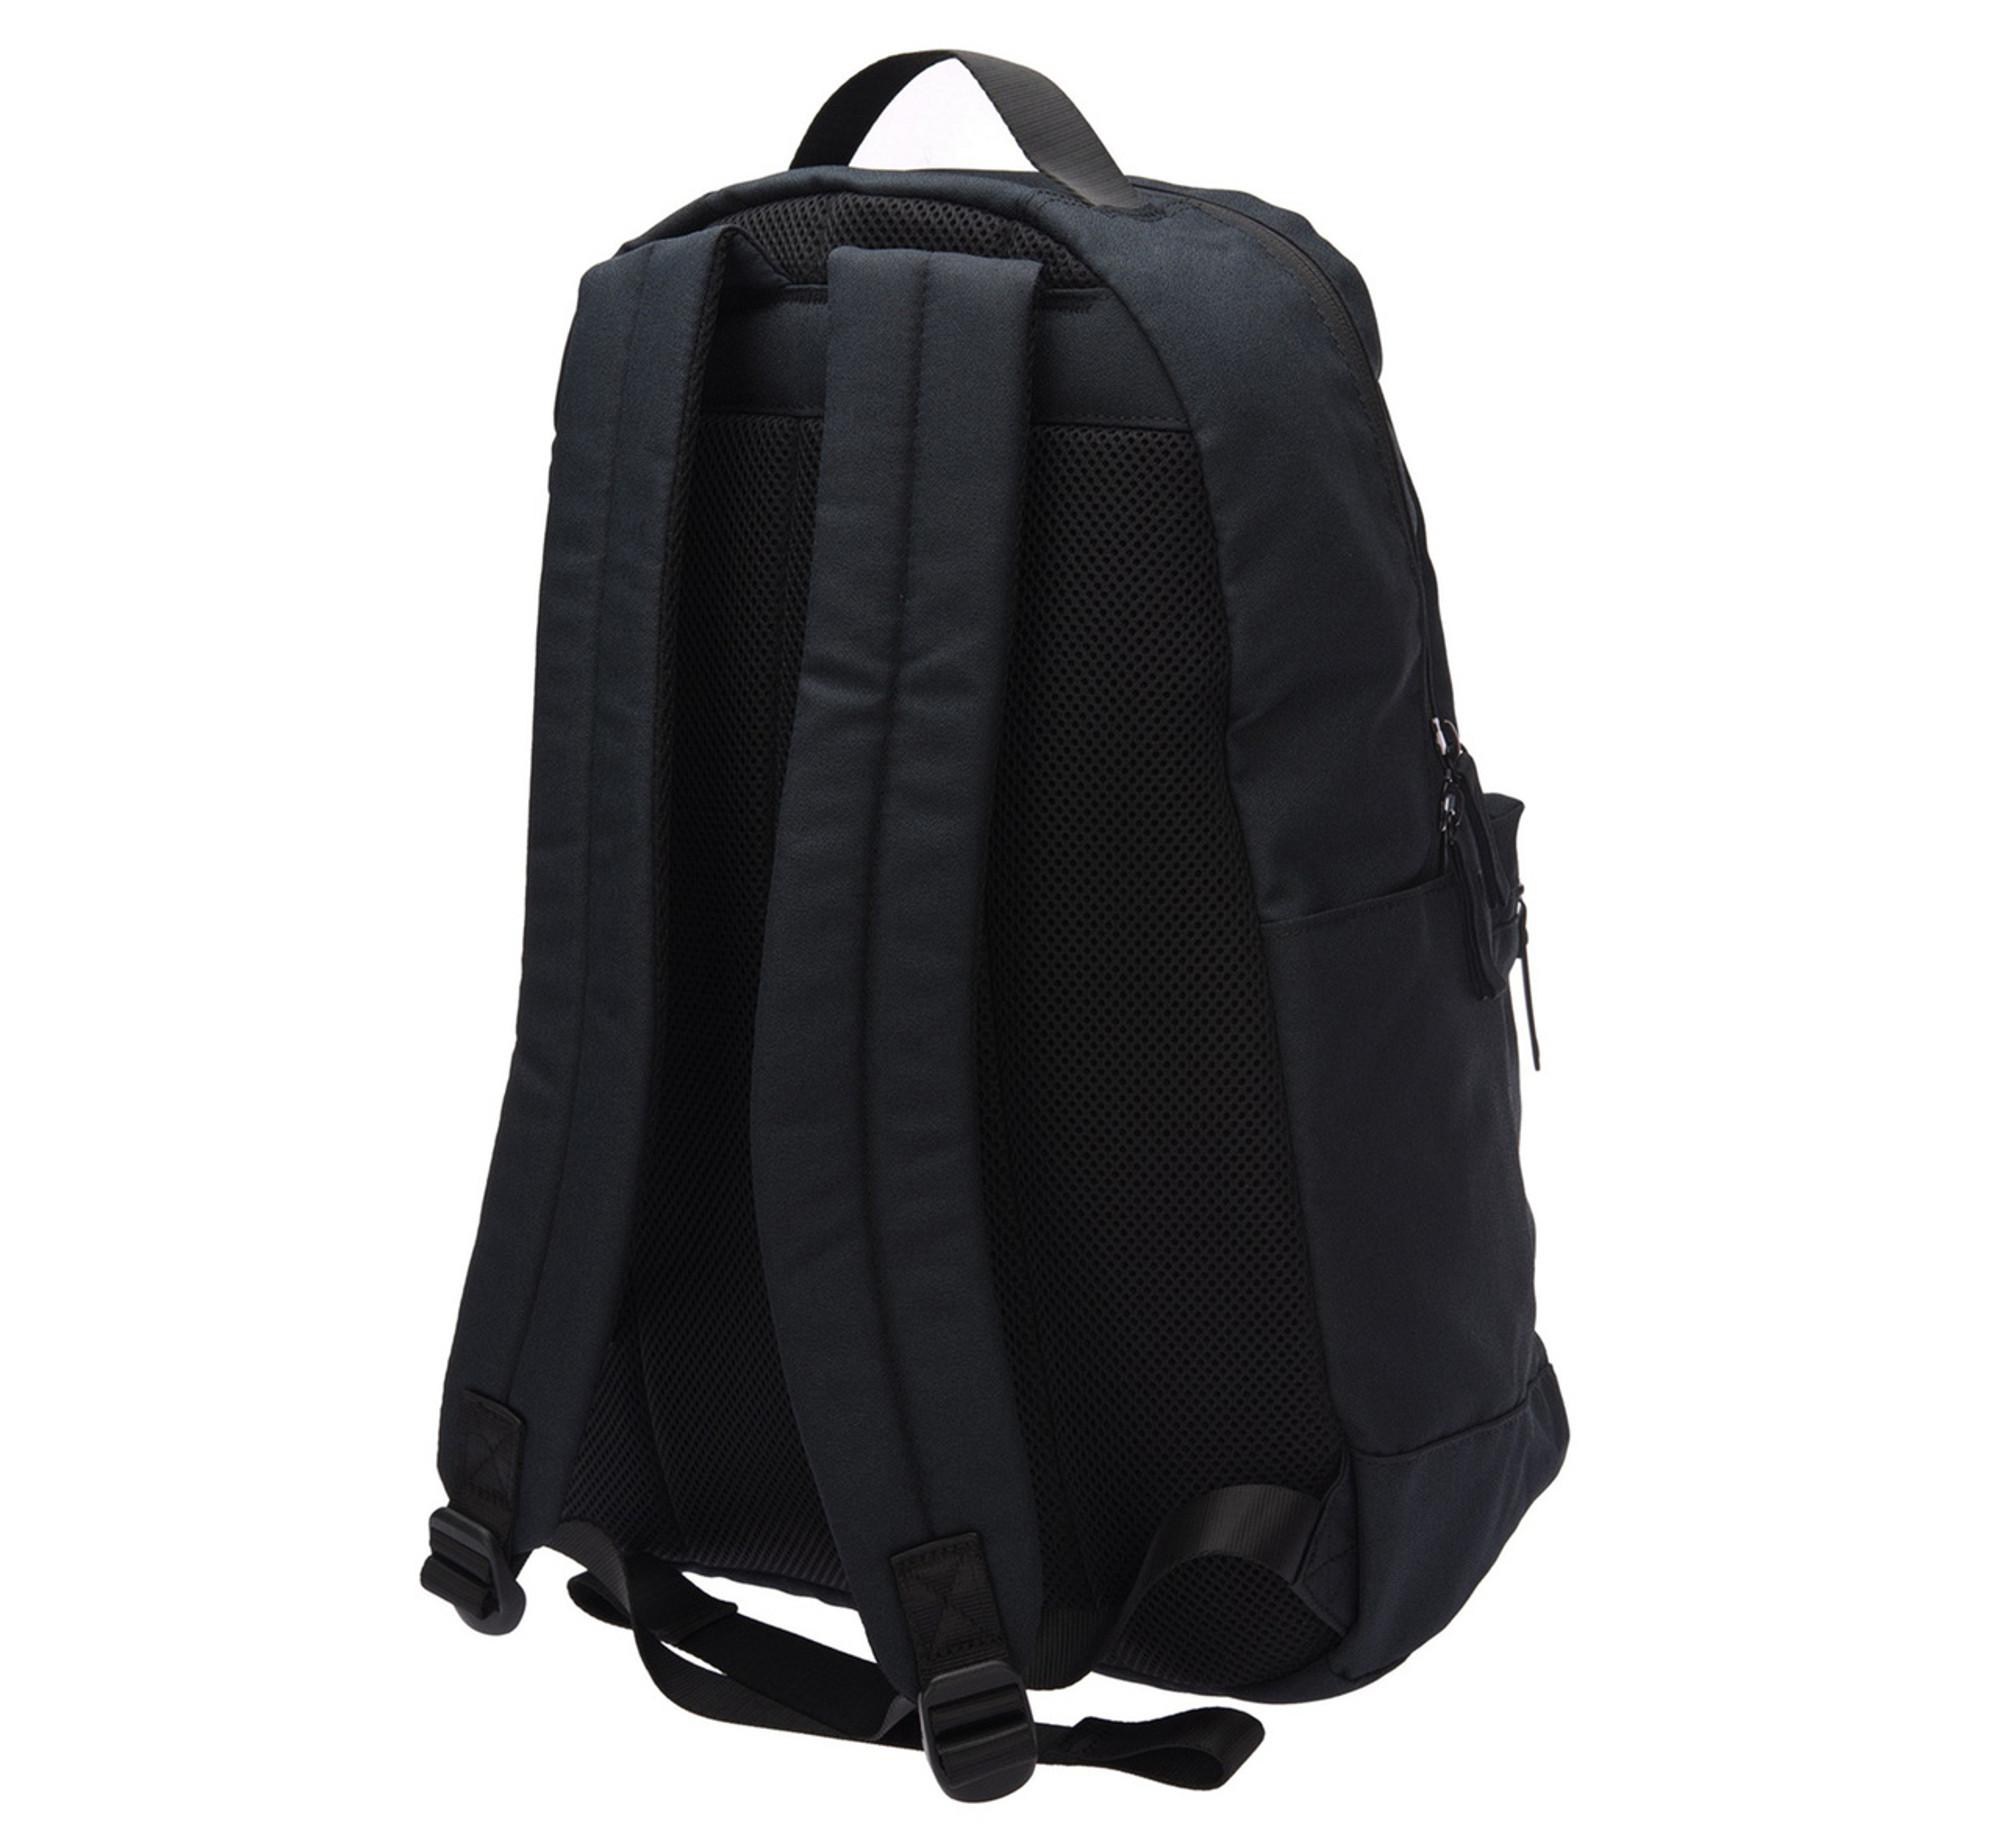 01b3450883b DWADE Lifestyle Backpack ABSM111-2   Shop online now at Sunlight Station